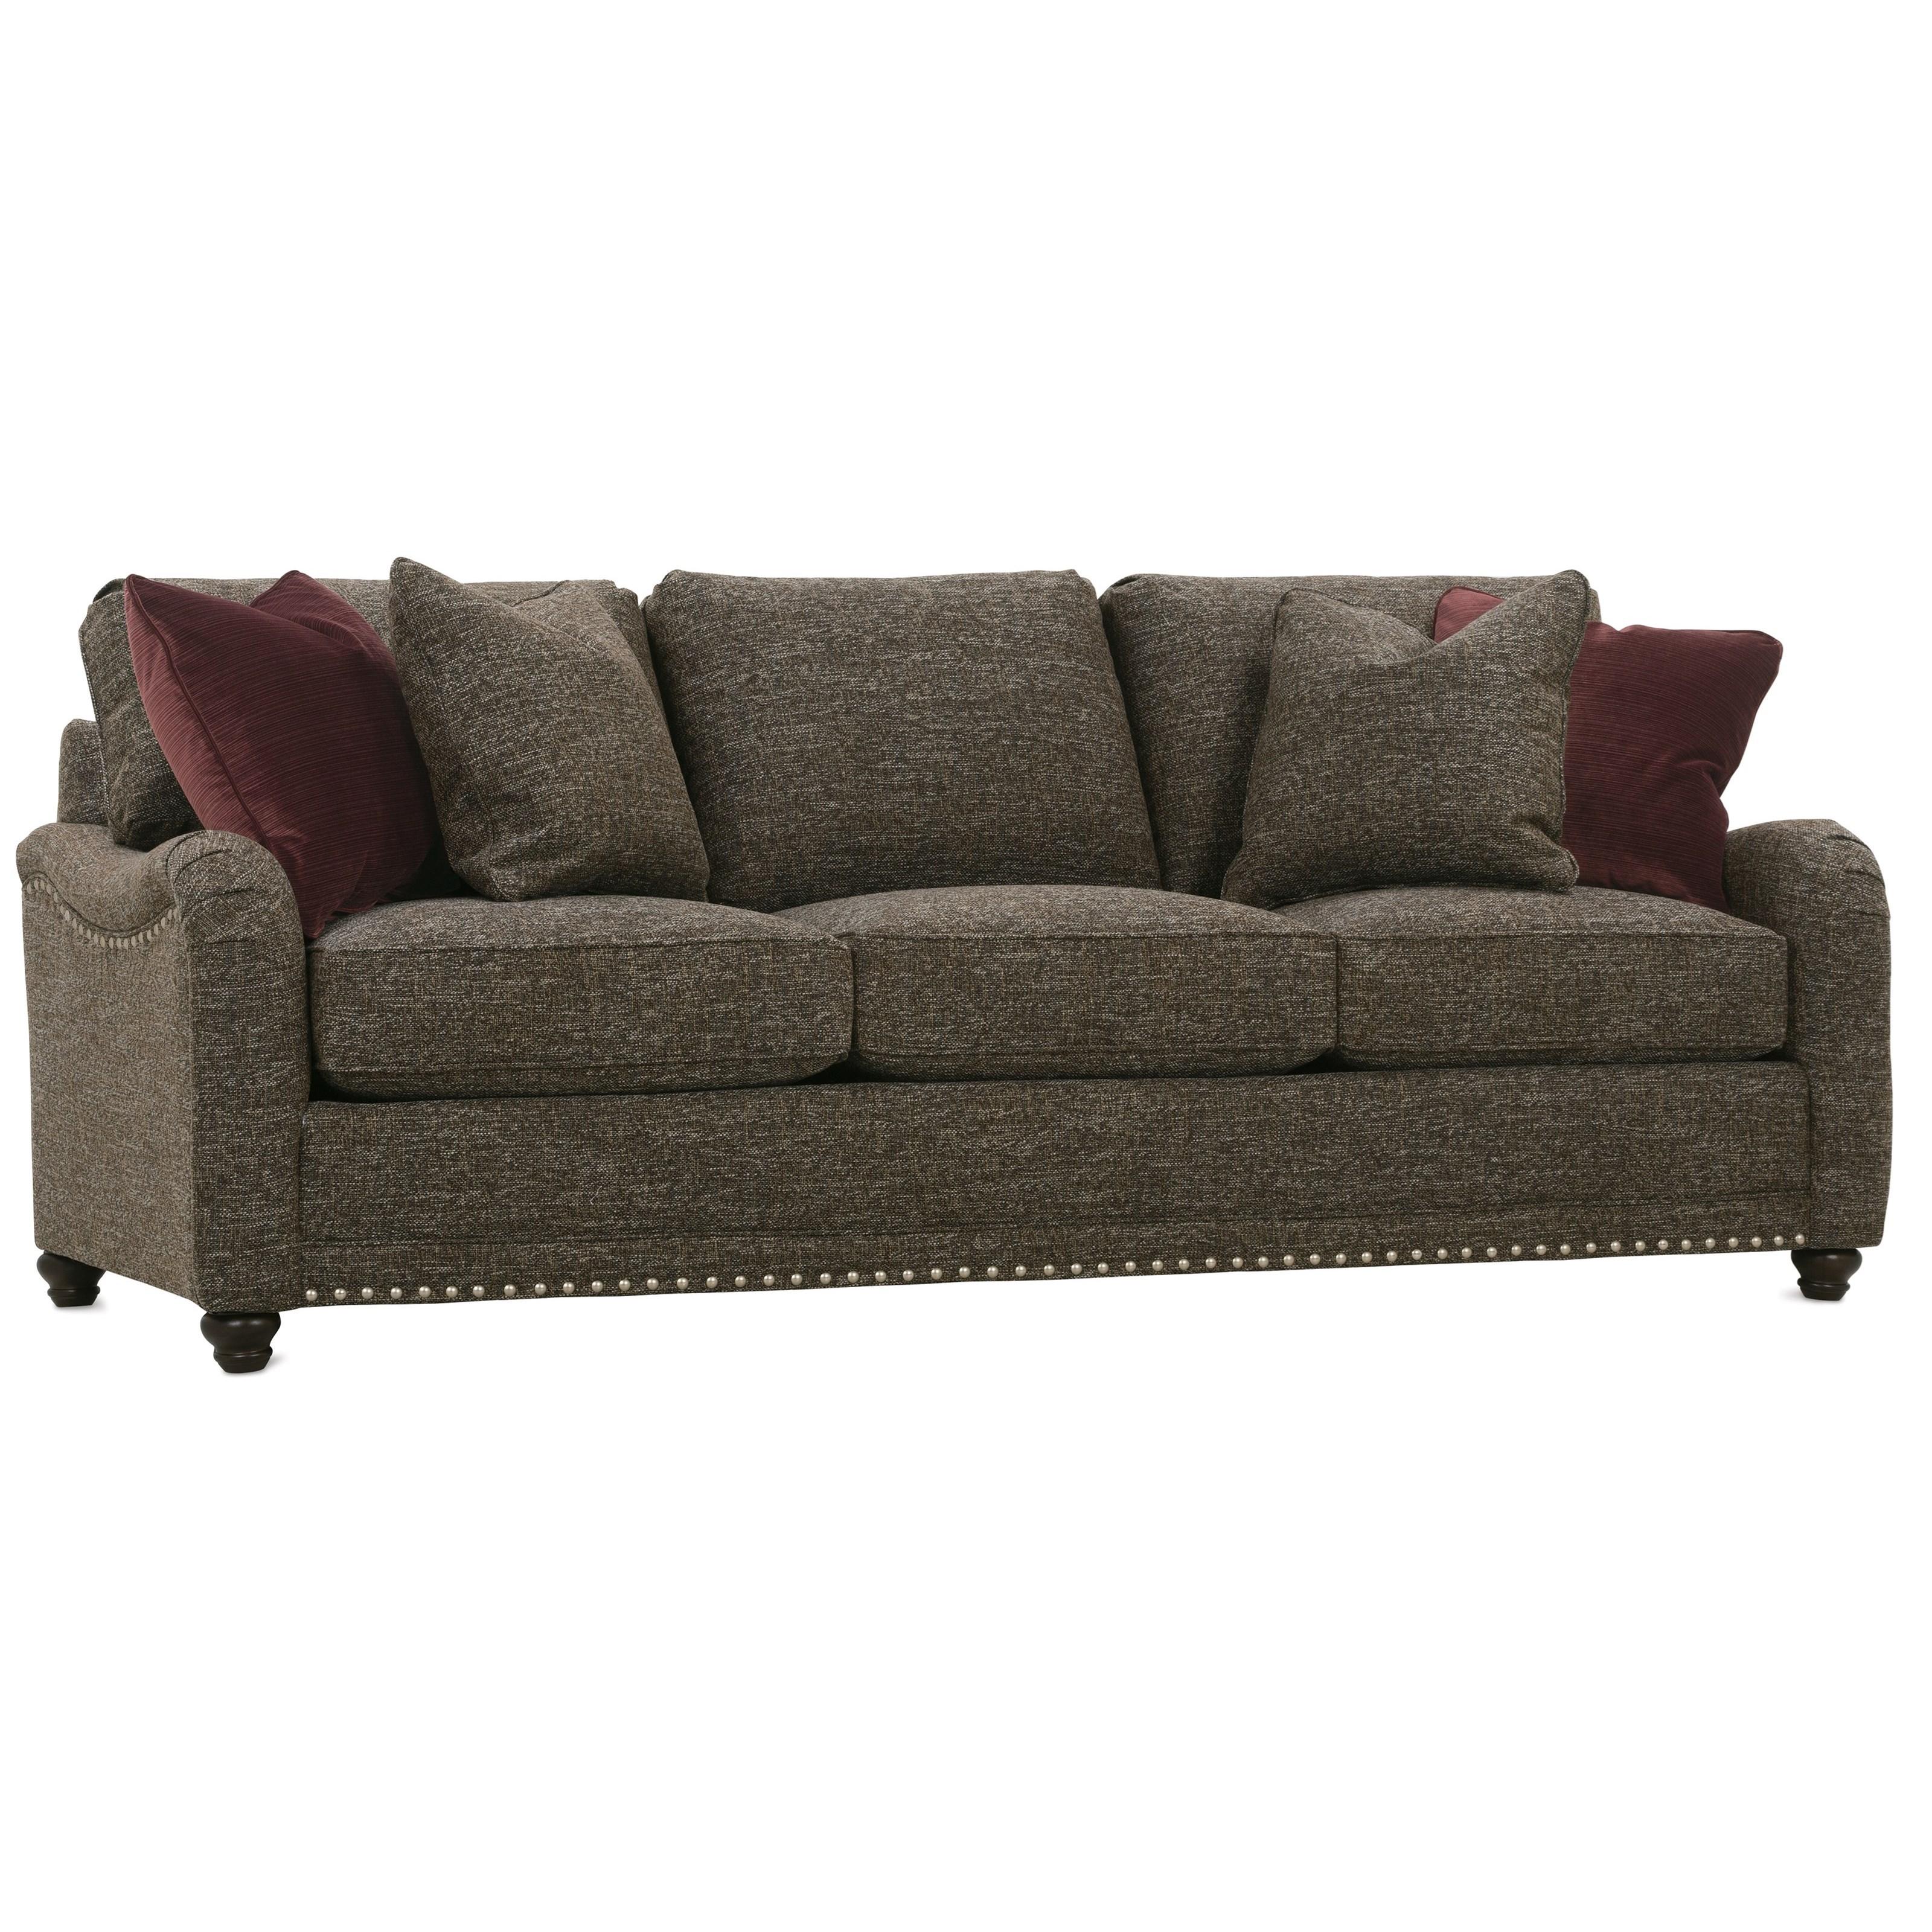 Beau Rowe My Style ICustomizable Sofa